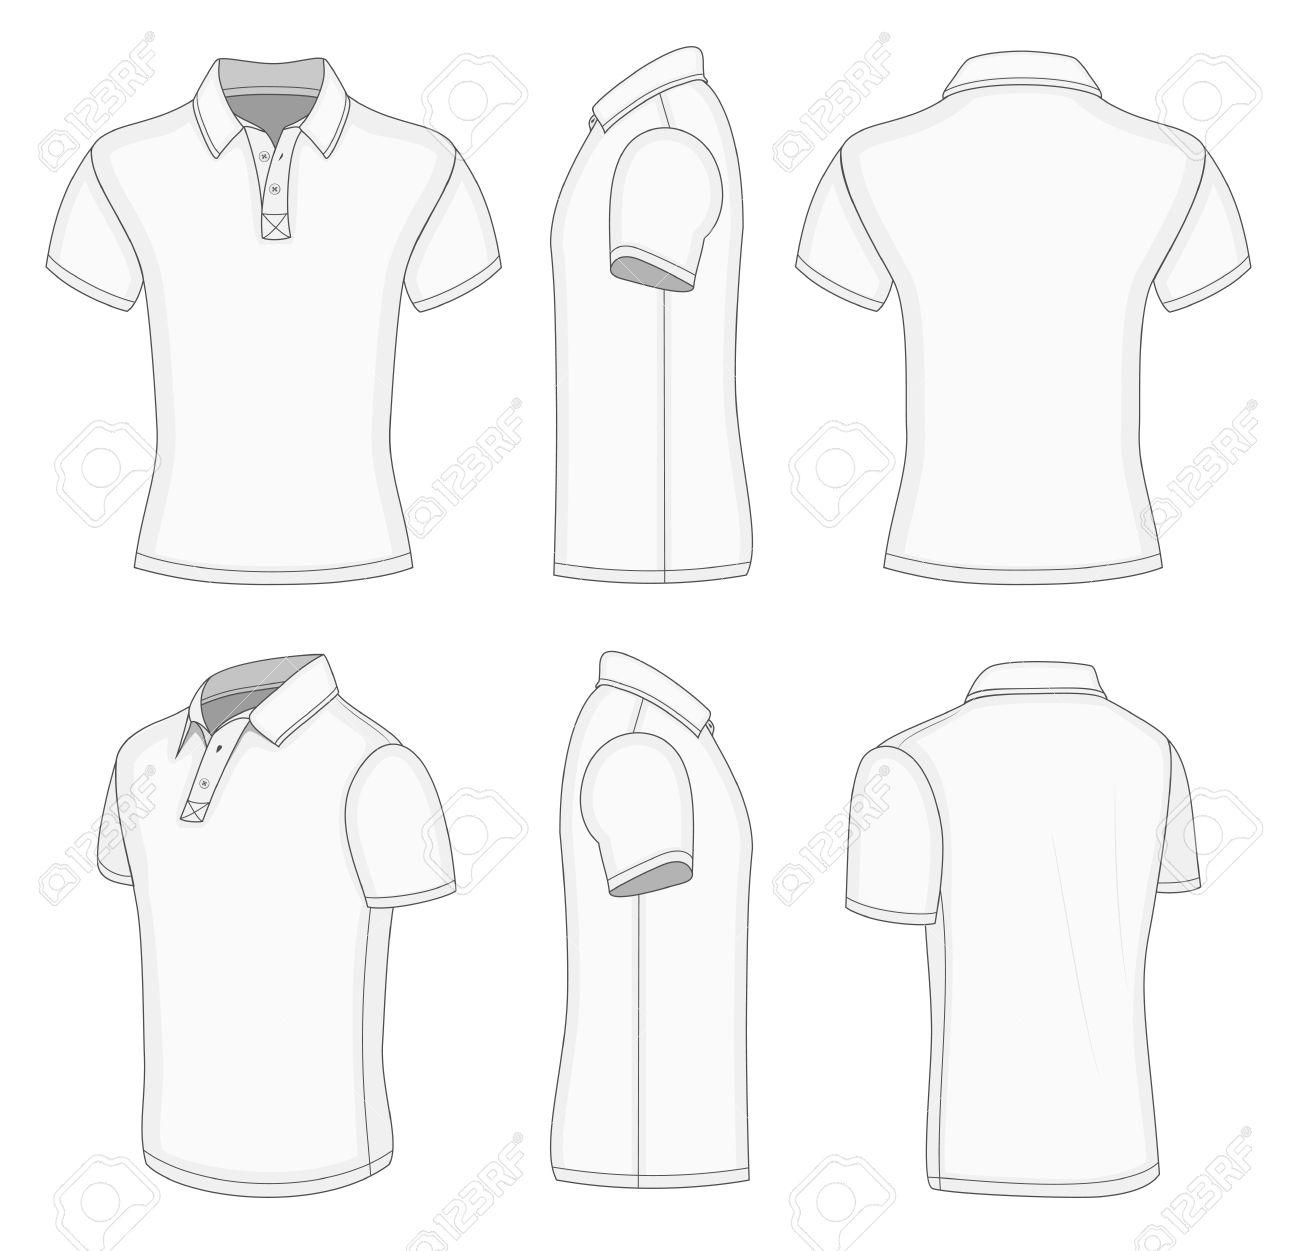 Shirt design white - Polo Shirt Mens White Short Sleeve Polo Shirt Design Templates Front Back